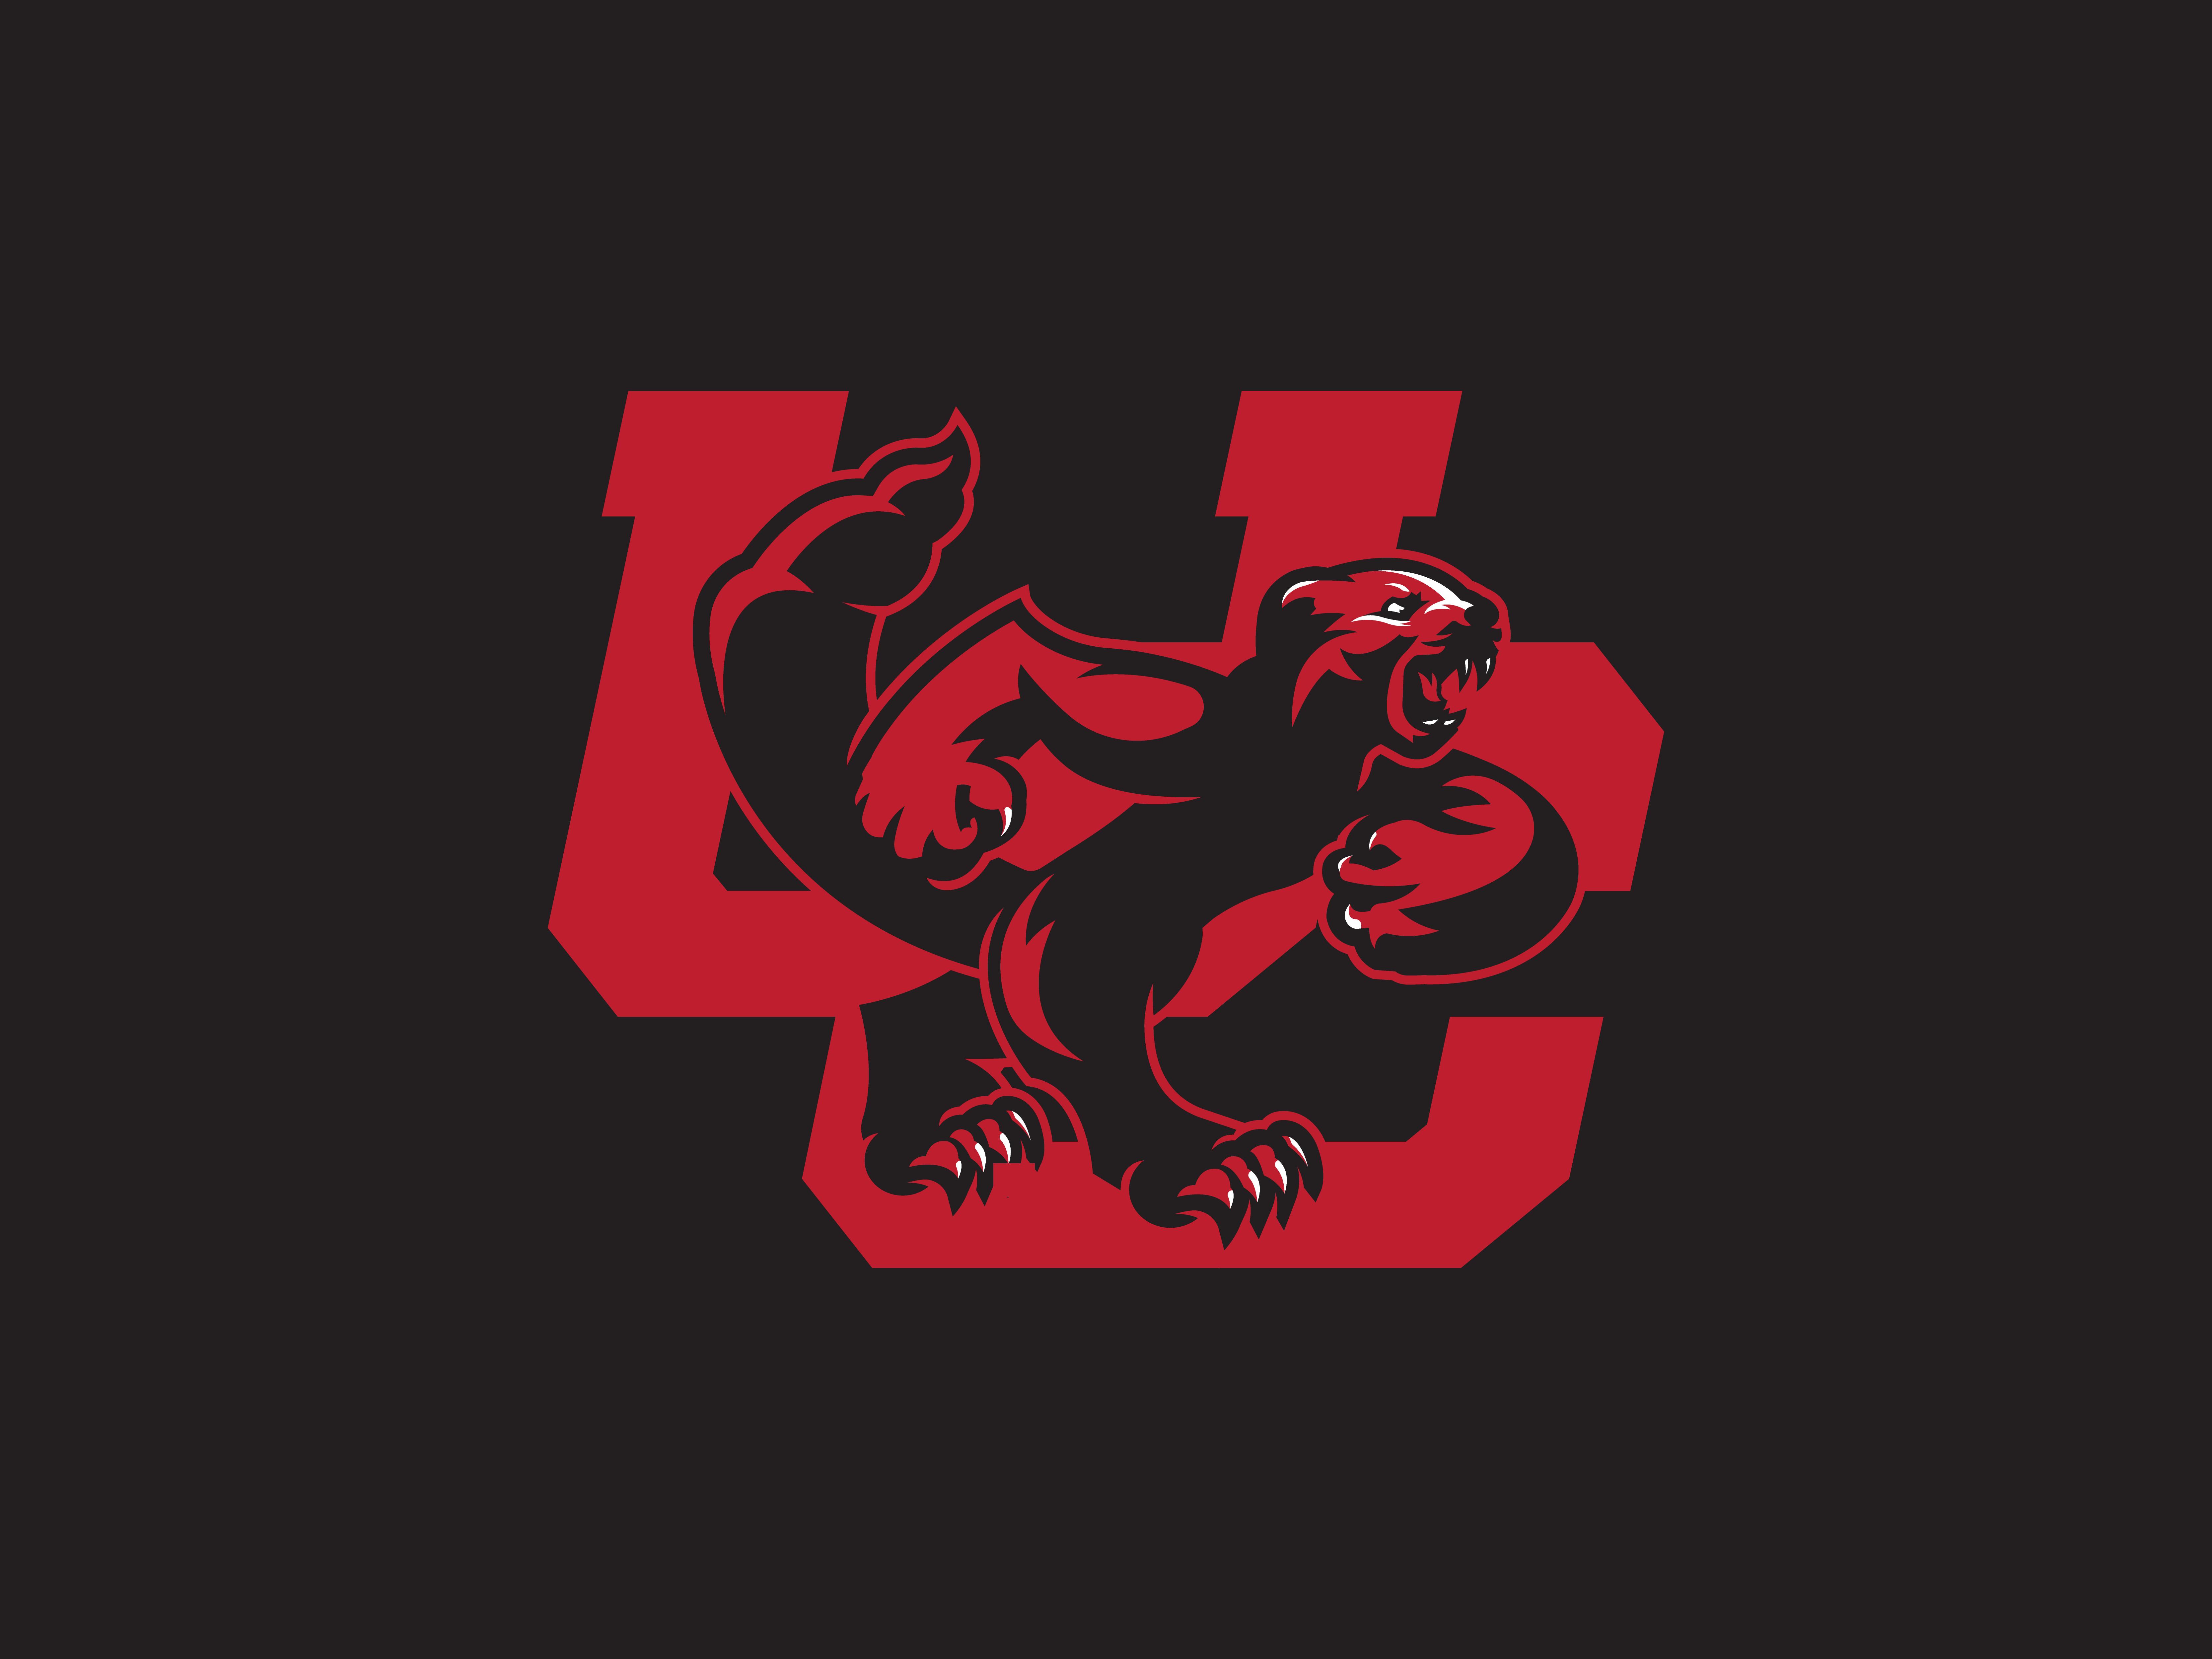 Uc dribbble 05